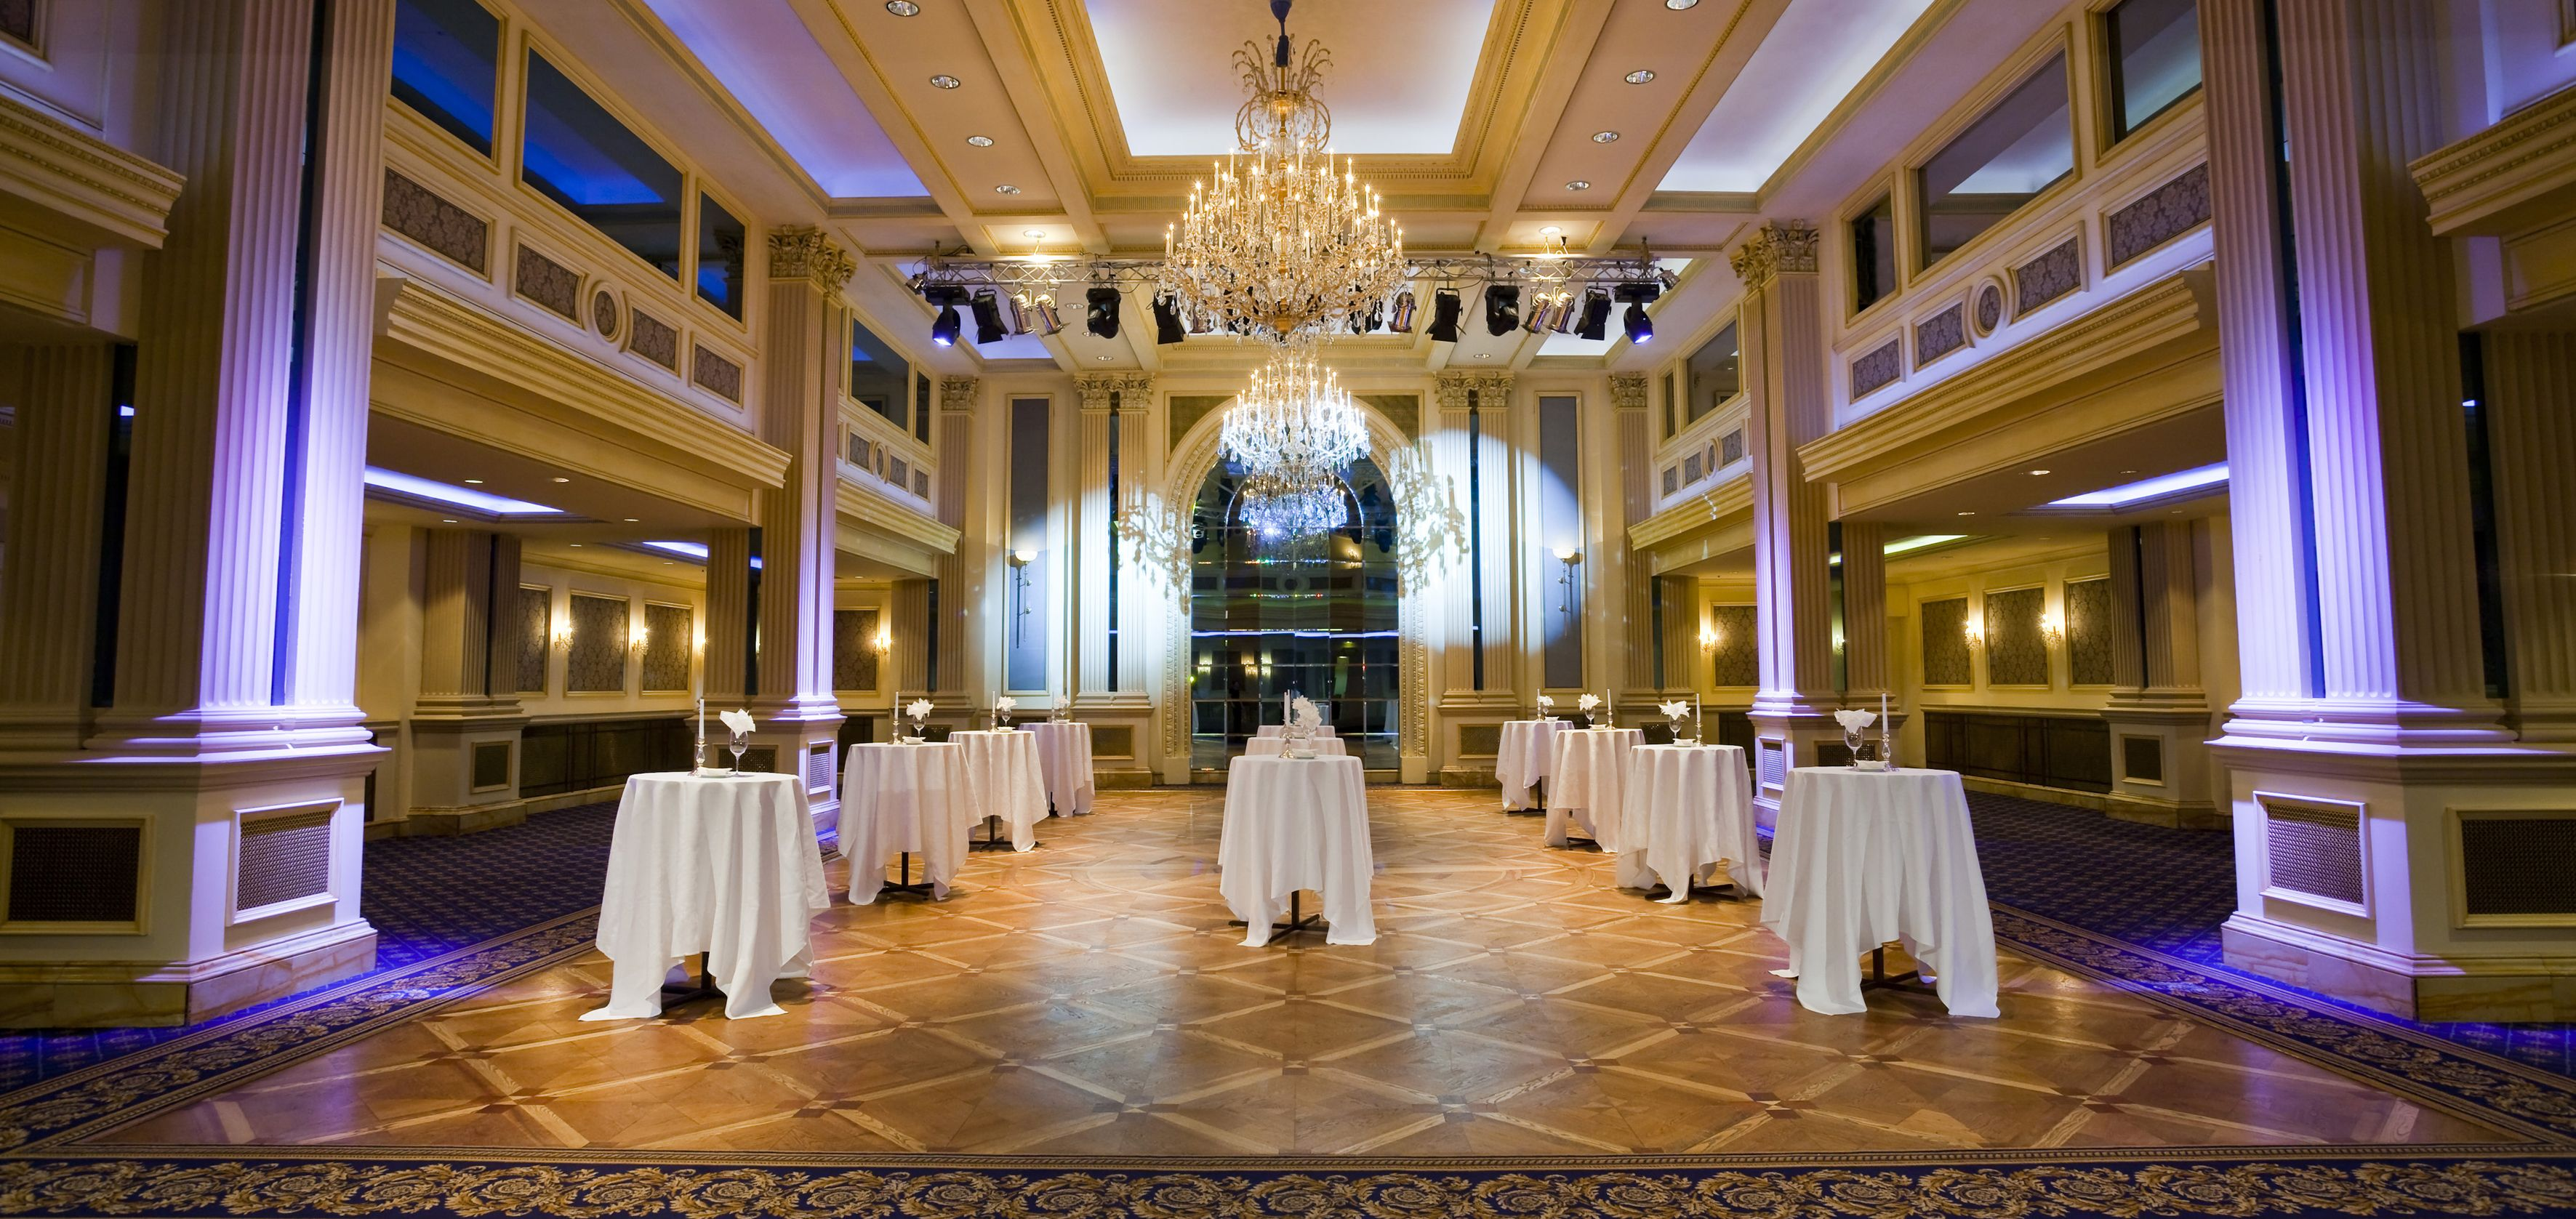 Grand Hotel Wien Luxpitality Grand Hotel Resort Lifestyle Hotel